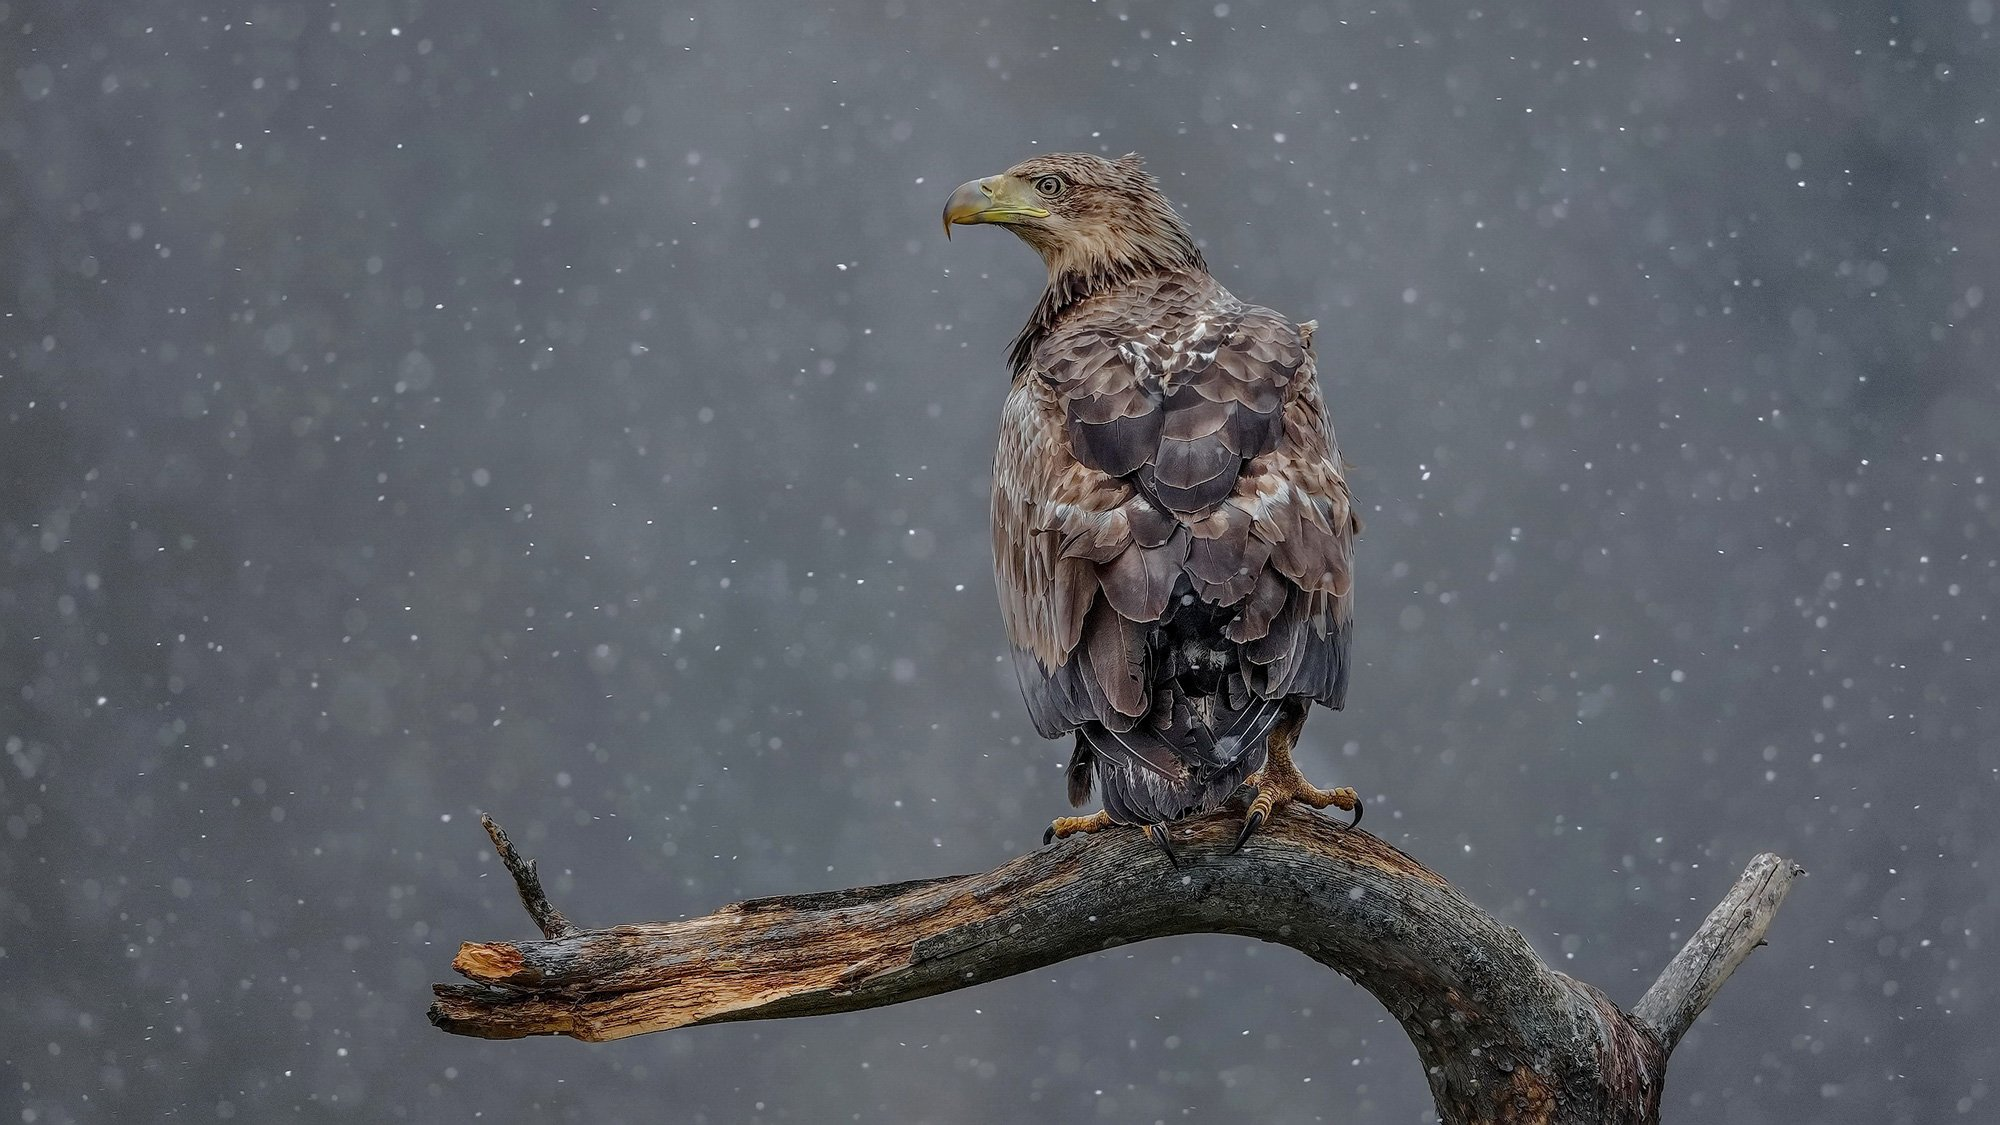 орлан белохвост haliaeetus albicilla white-tailed eagle, Eugenijus Kavaliauskas